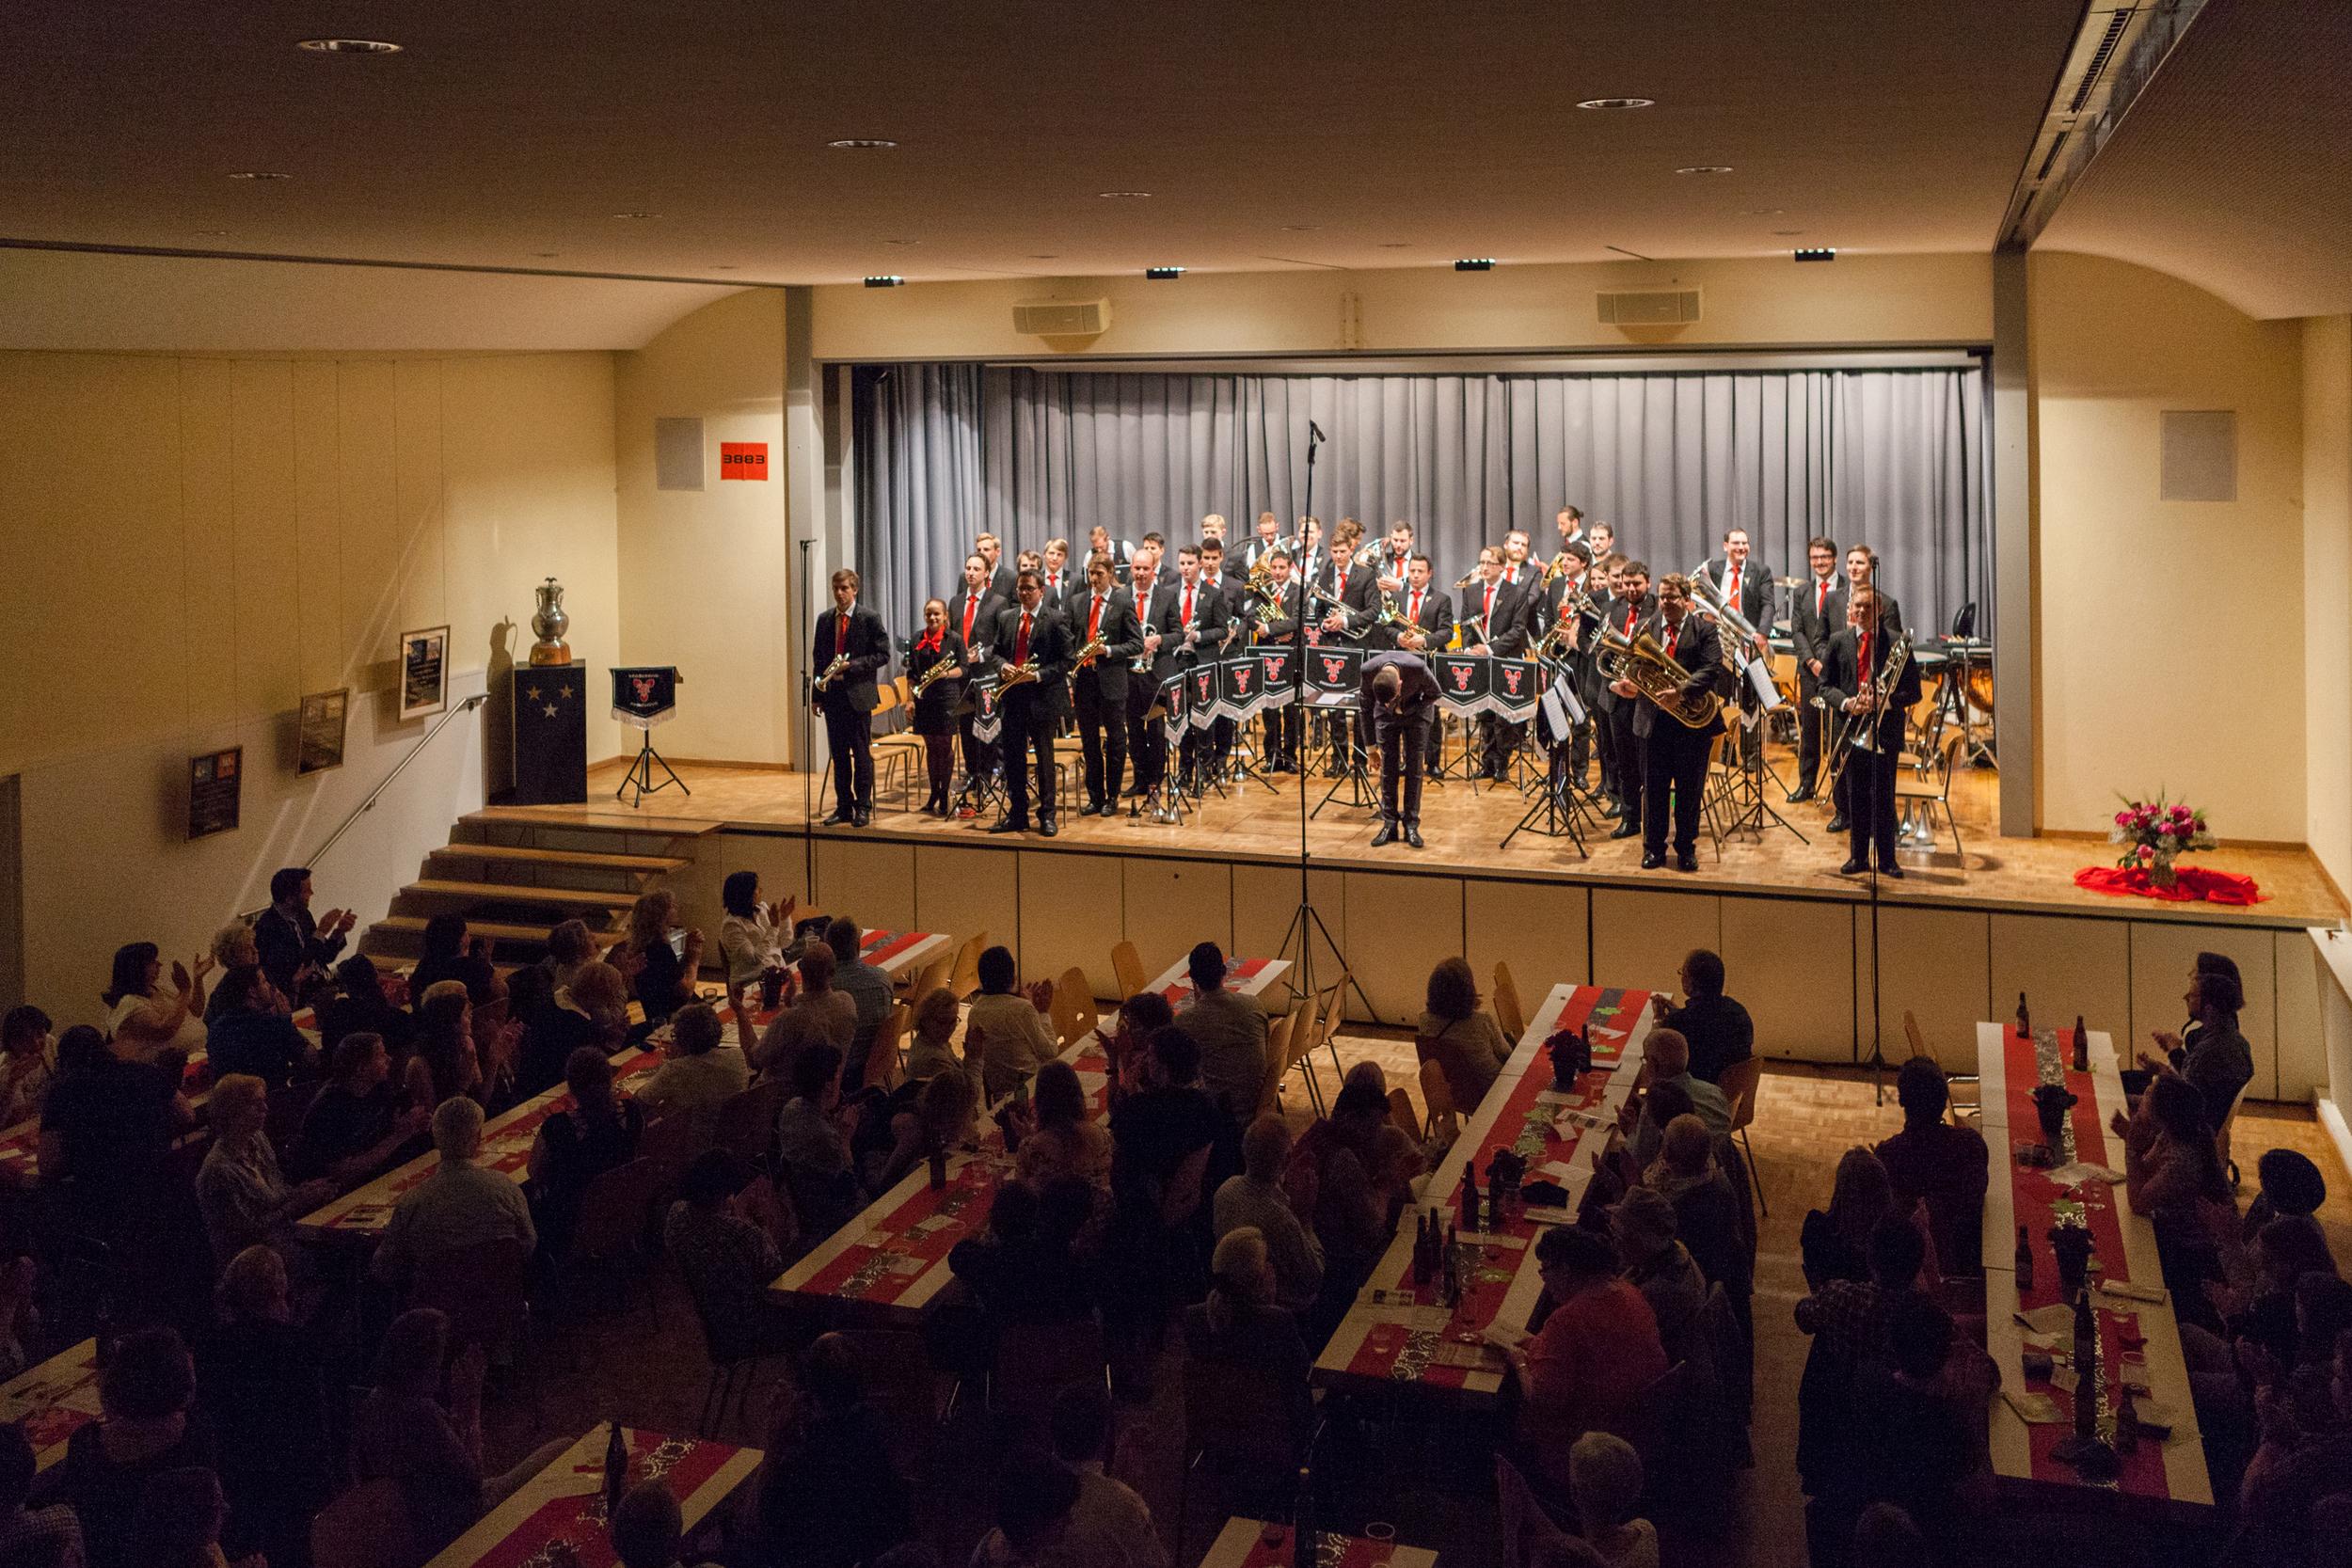 20160521_Brassband Abinchova_Jubila¦êumskonzert im Pfarreiheim in Ebikon_12.jpg